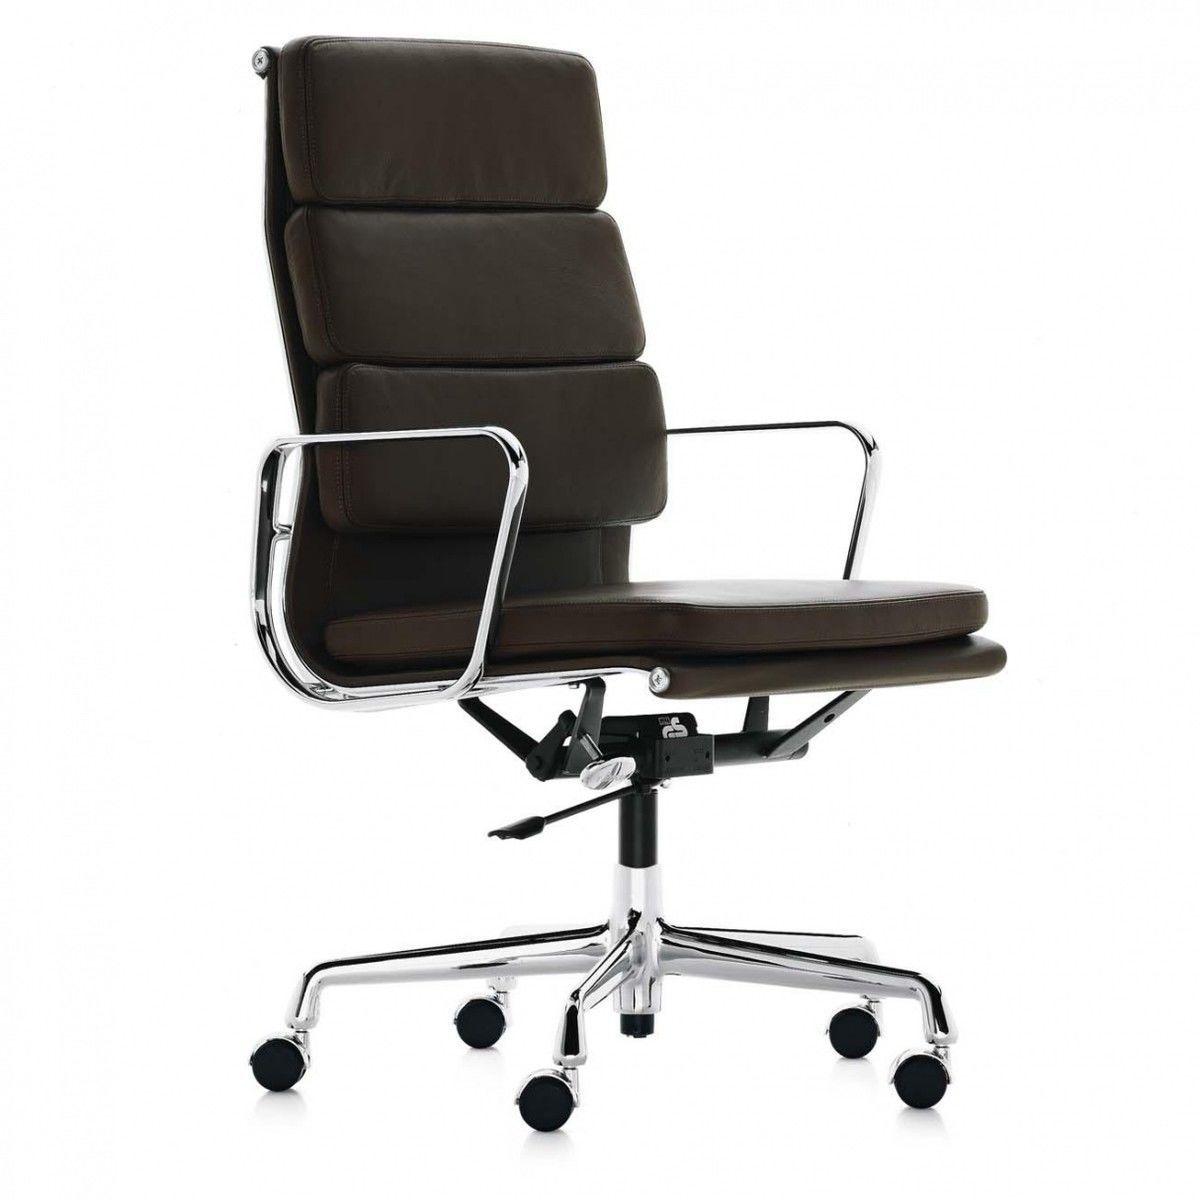 Ea 219 soft pad eames chair chaise de bureau vitra for Vitra soldes